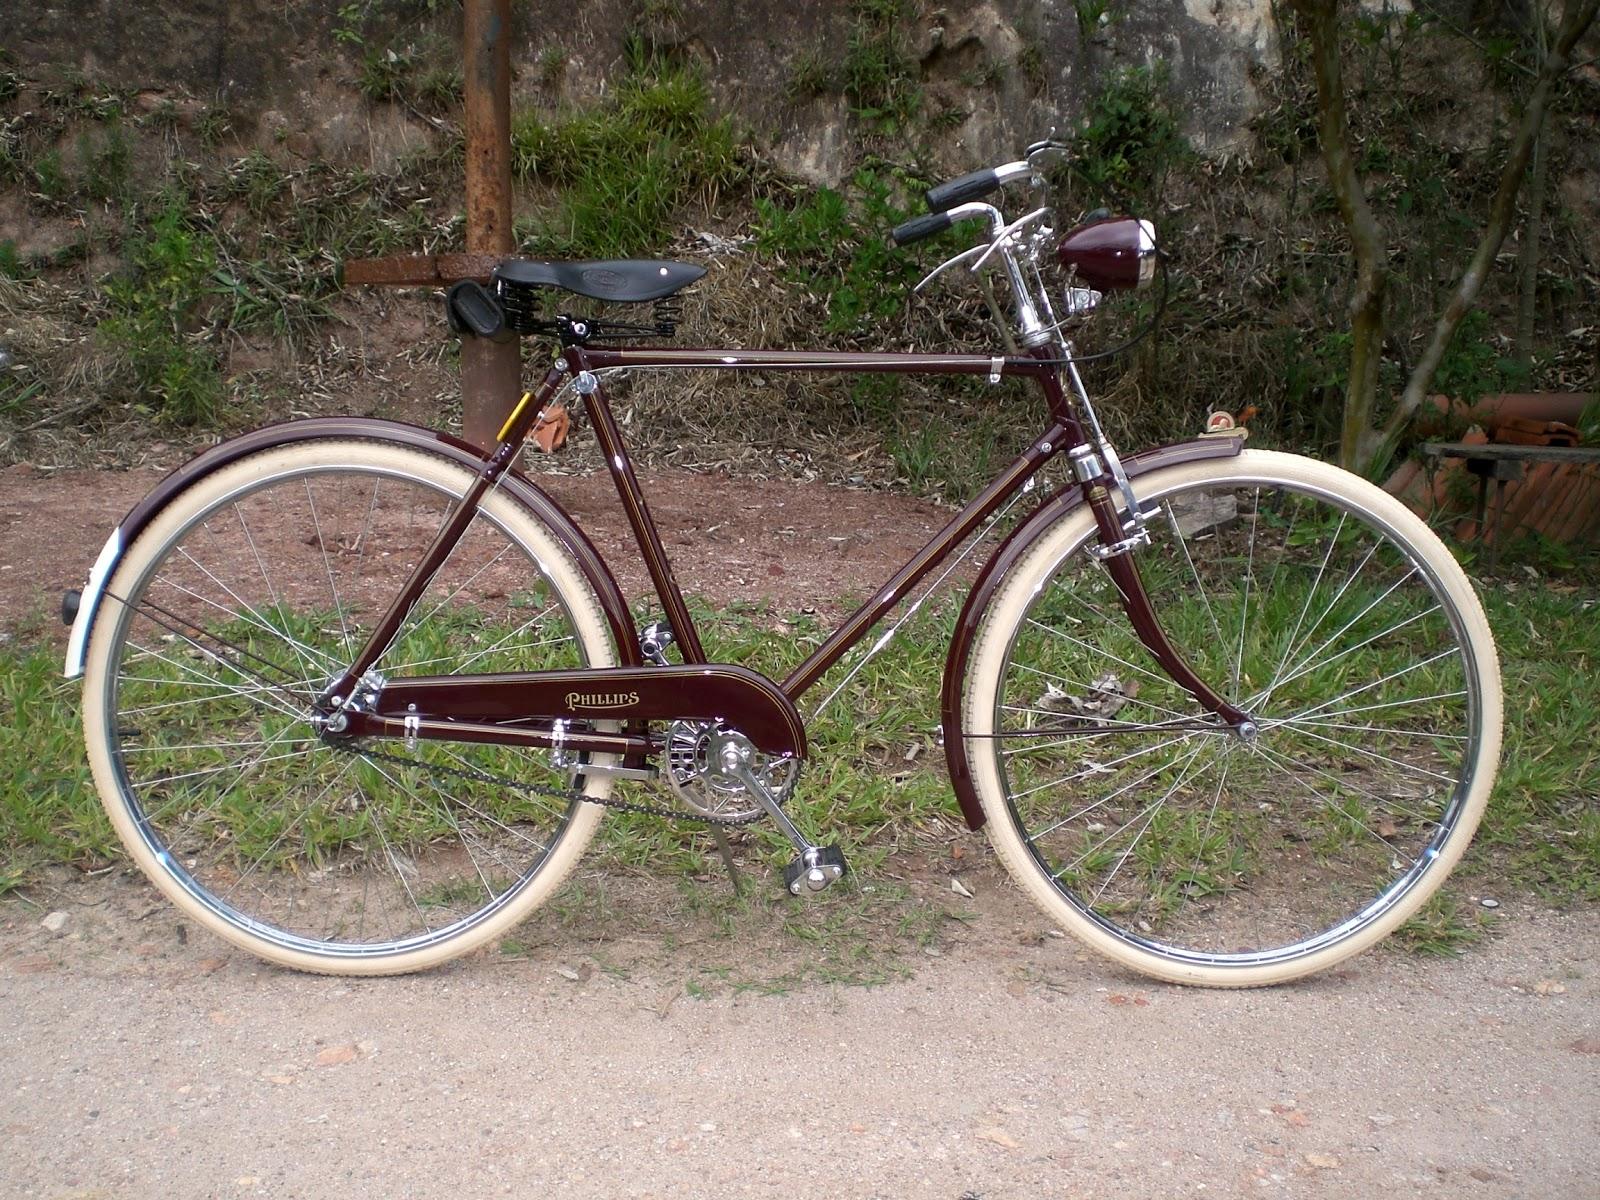 Ni Bicicleta Ni Bicicleto: Bicicletas Antigas: PHILLIPS MASCULINA 1950